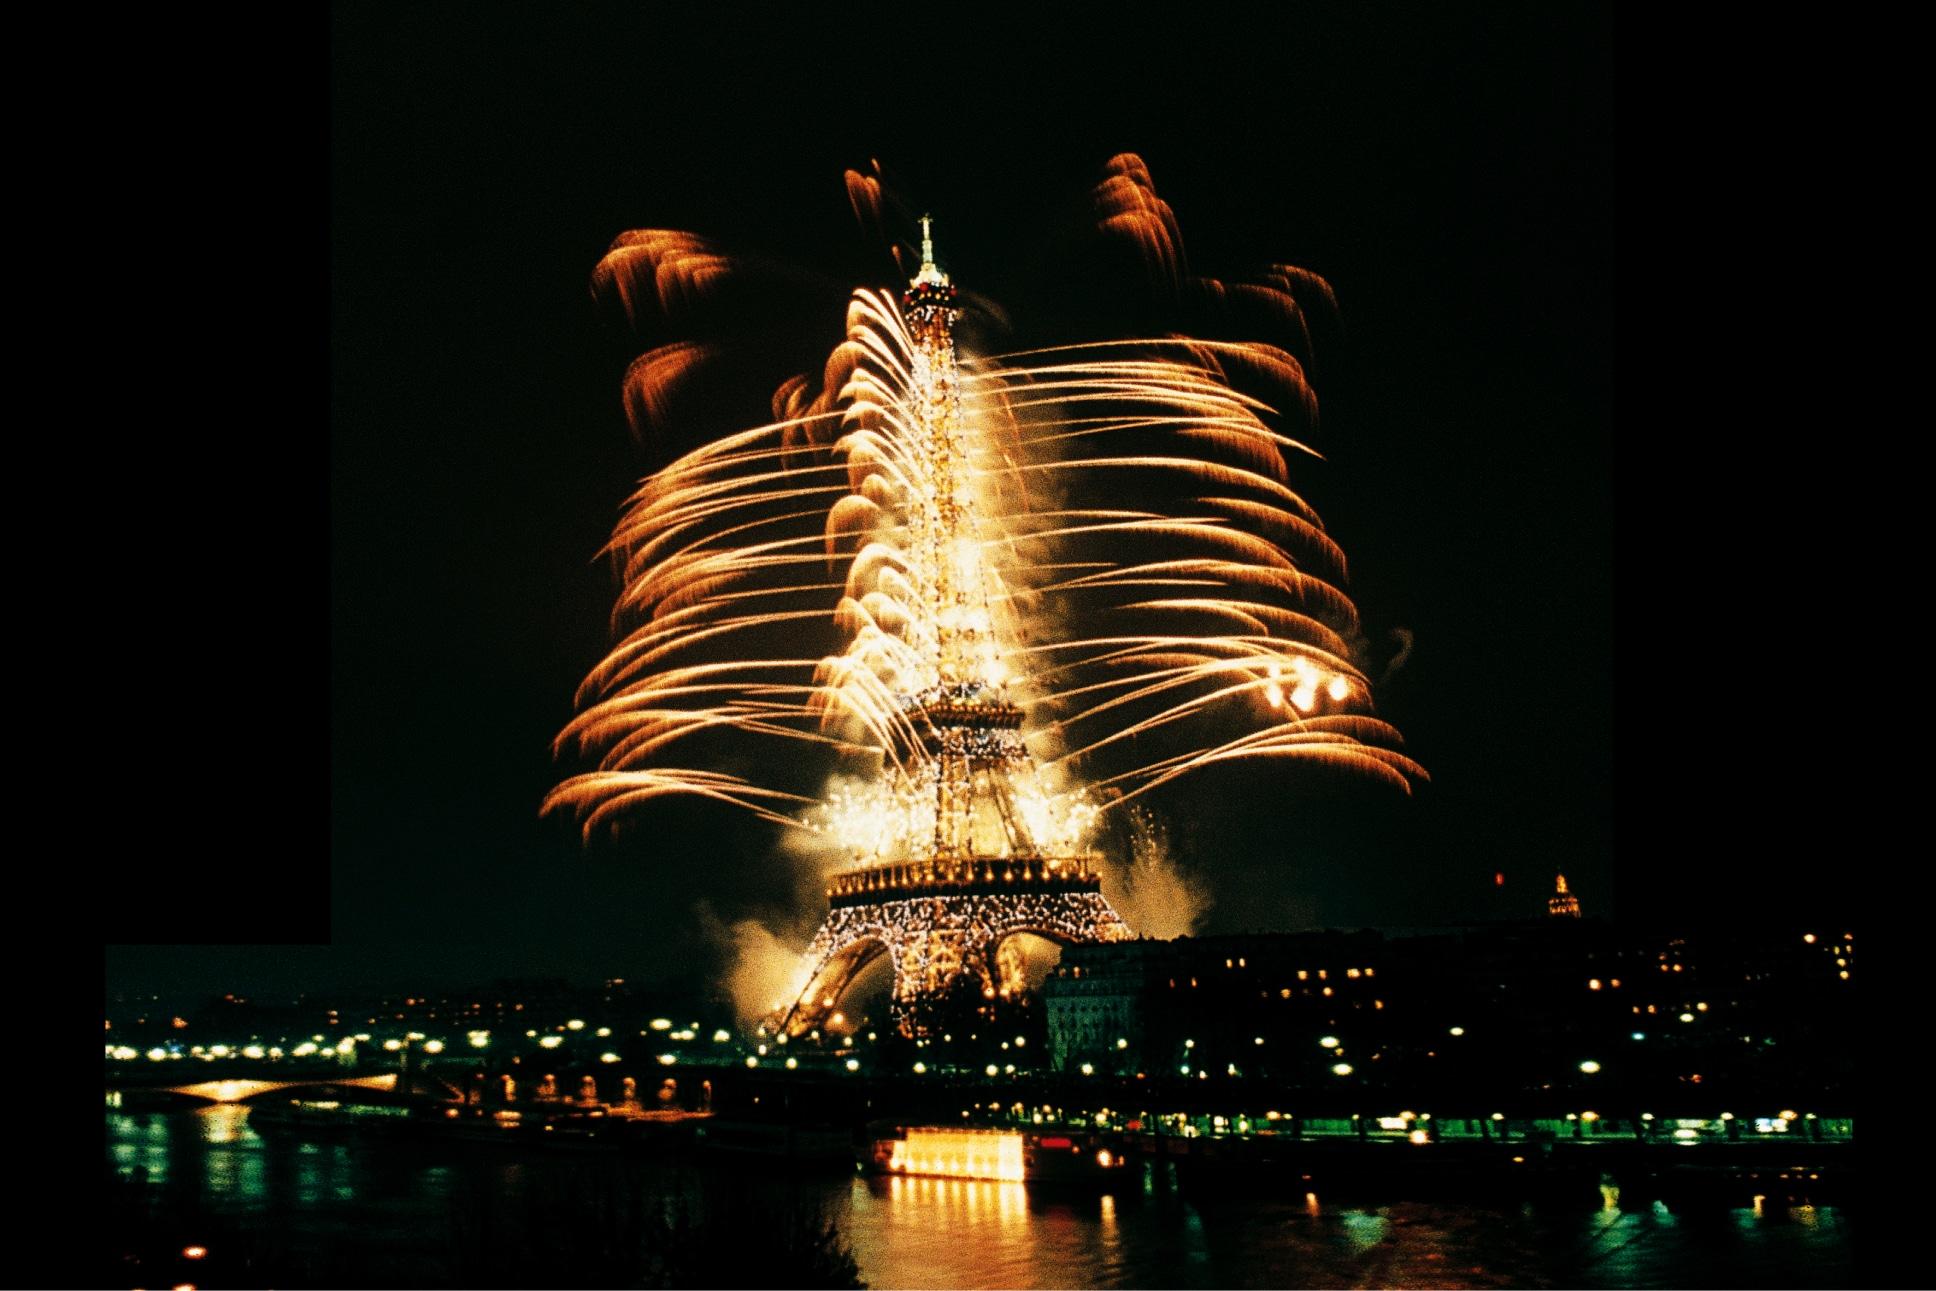 Eiffel-Tower-Millenium-Show-Paris-1